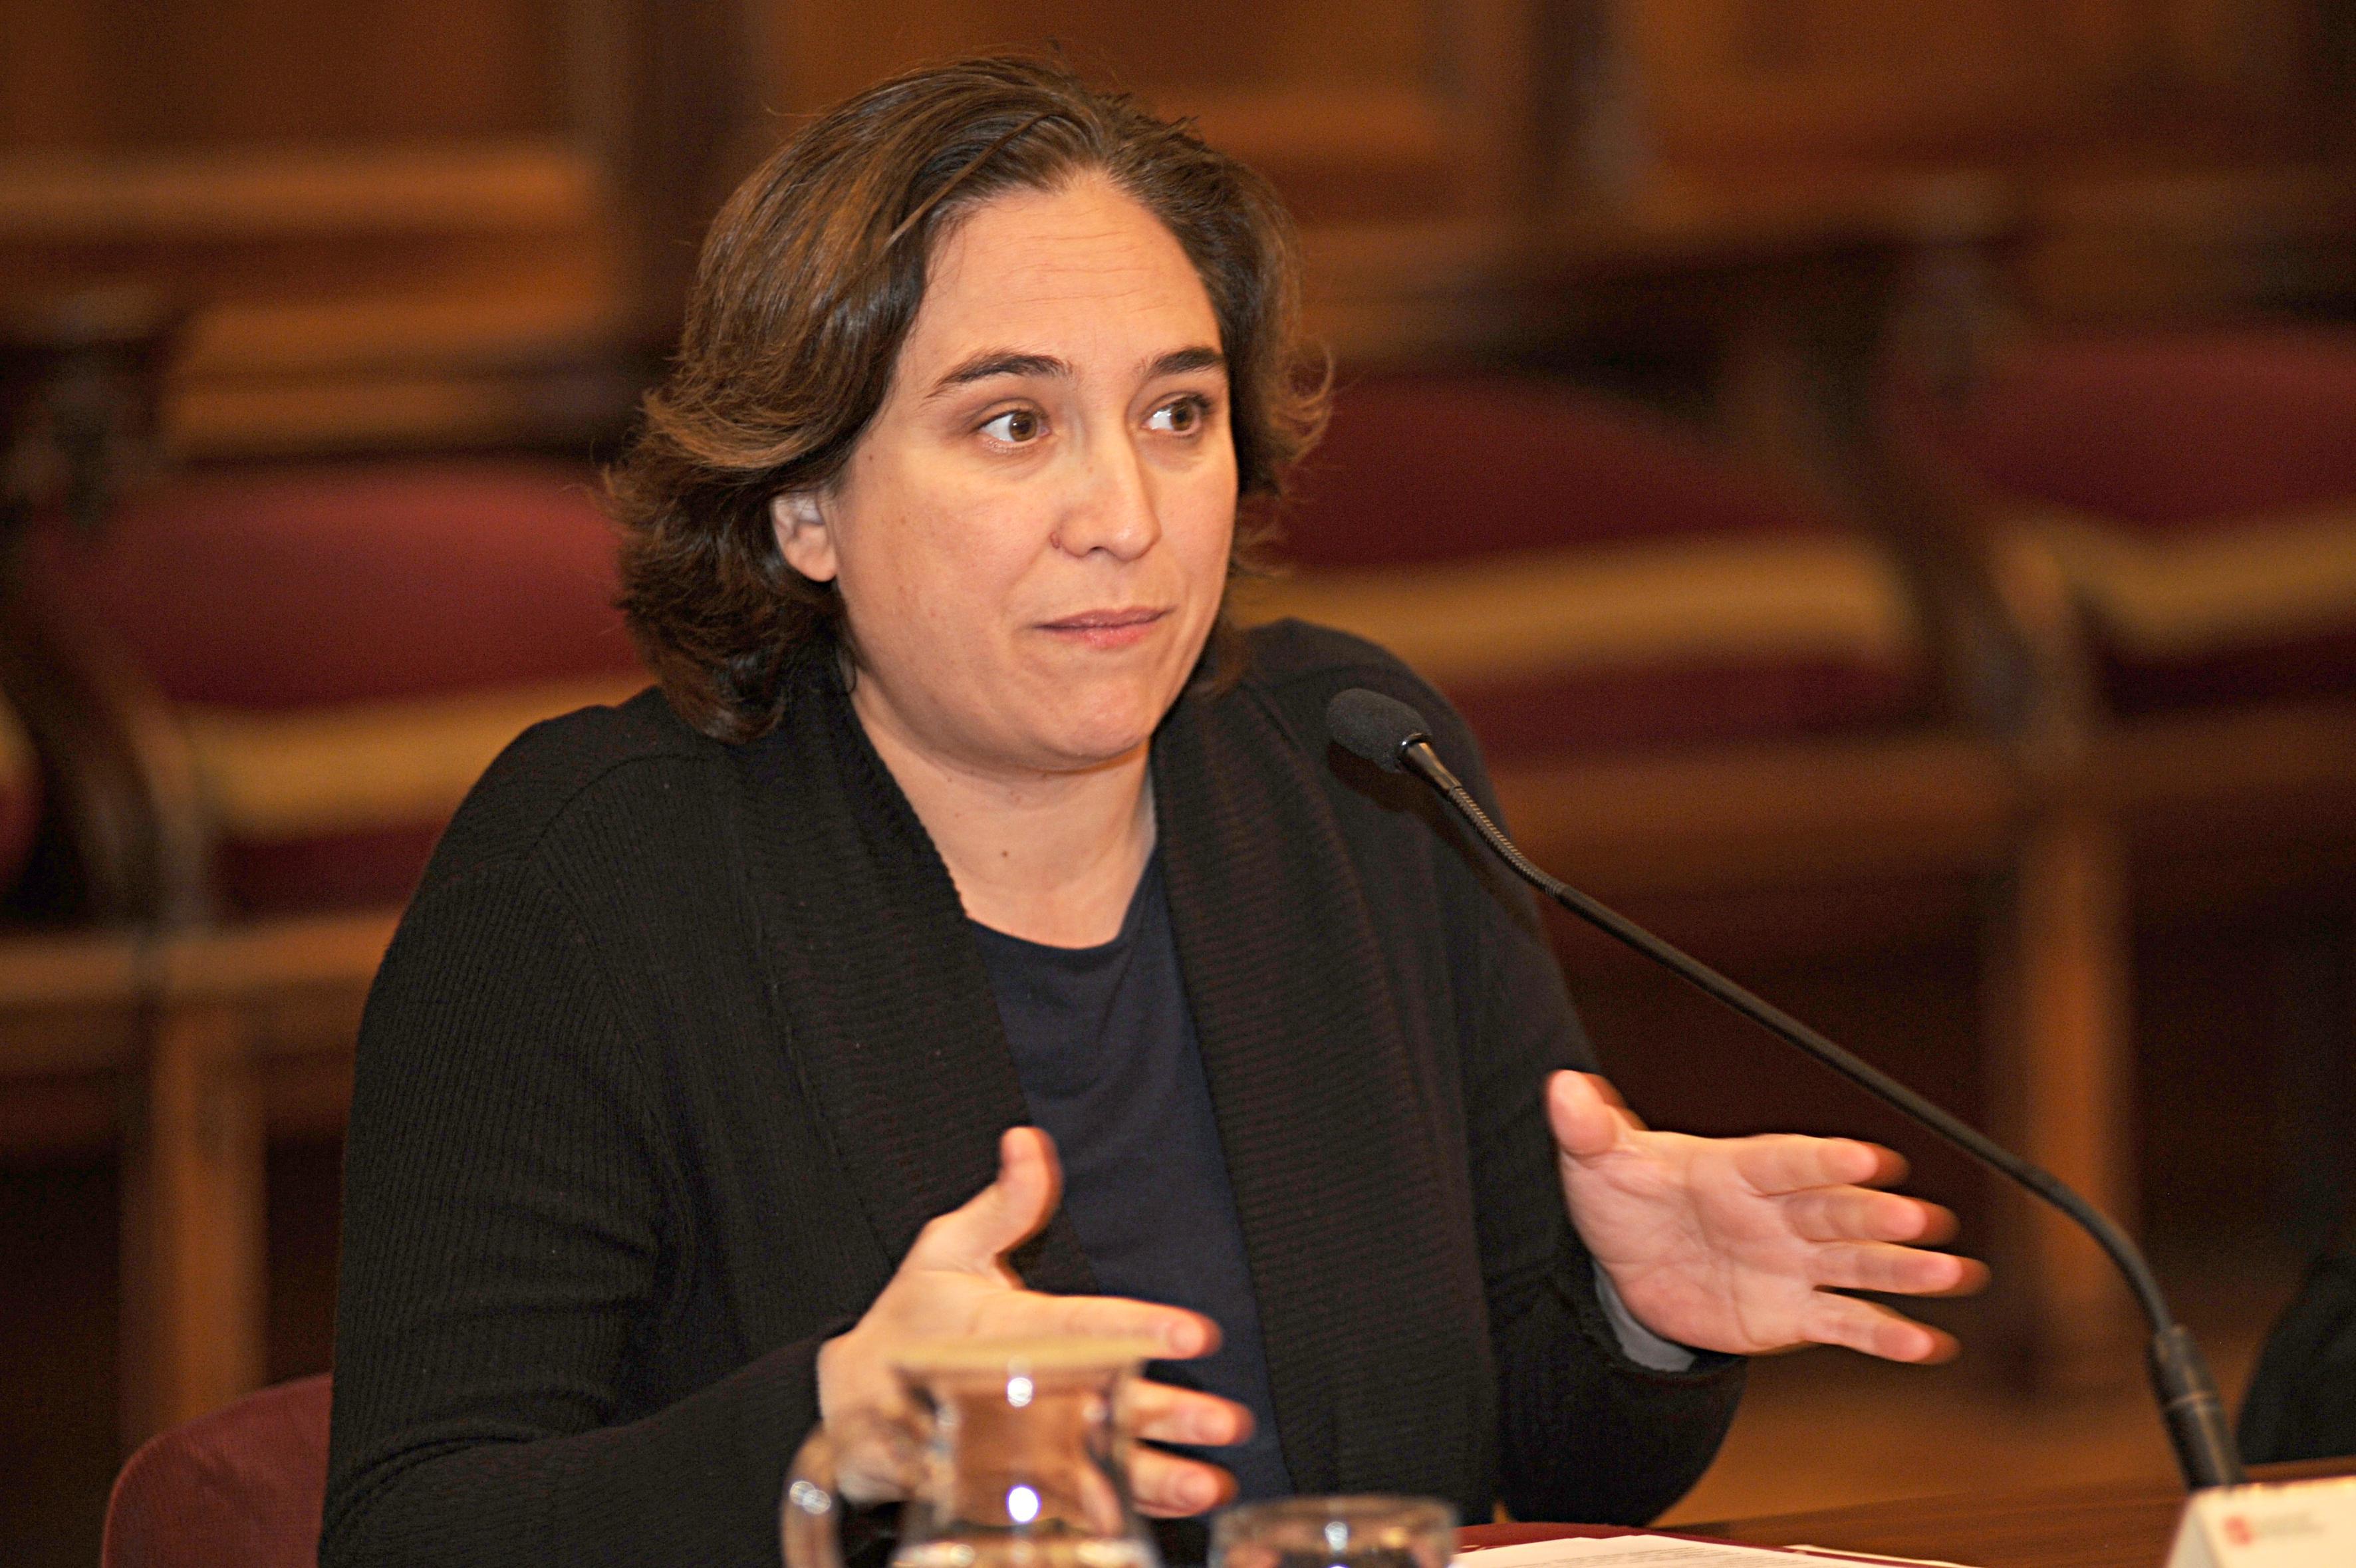 Presidenta del Consell General del PEMB, Ada Colau